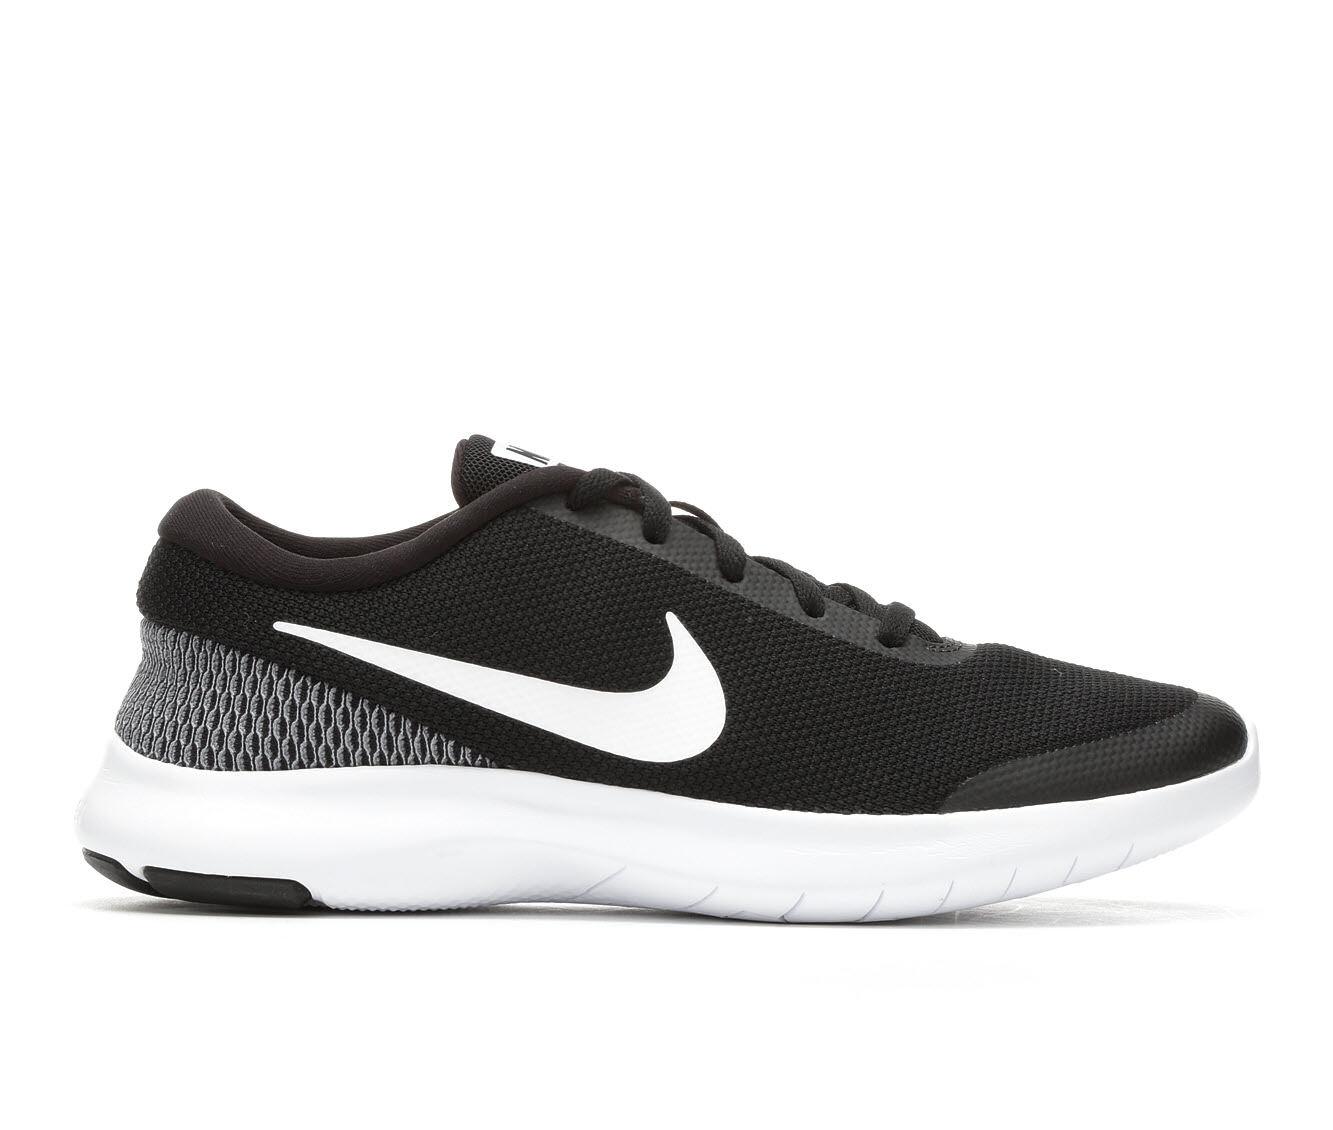 UK Sale Women's Nike Flex Experience Run 7 Running Shoes Black/White